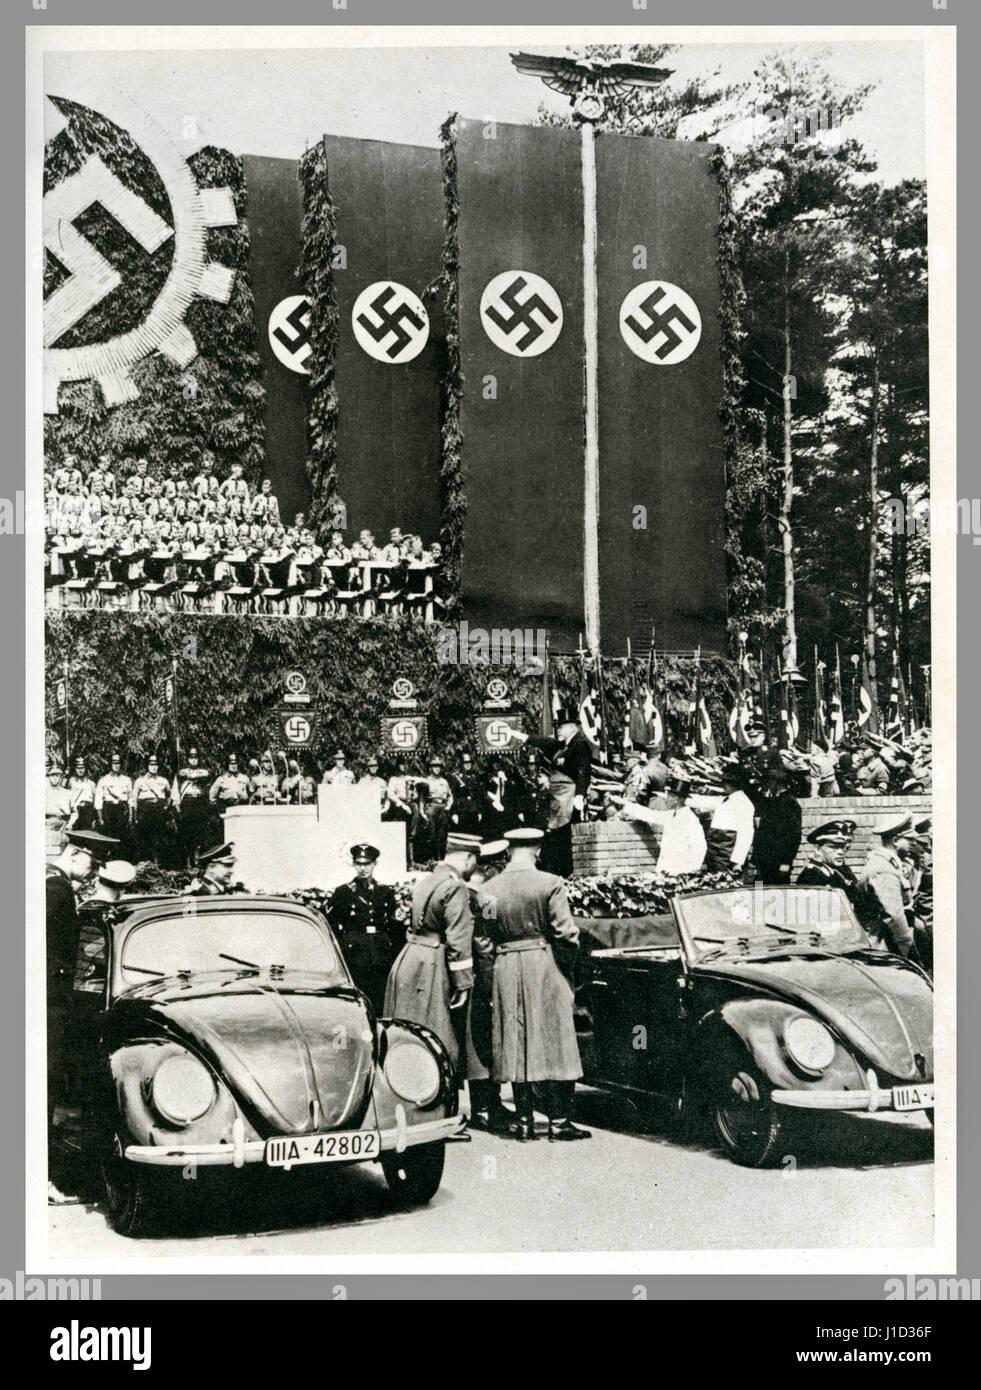 German propaganda image May 26th 1938 foundation stone laying ceremony at Fallersleben Wolfsburg Volkswagen factory - Stock Image